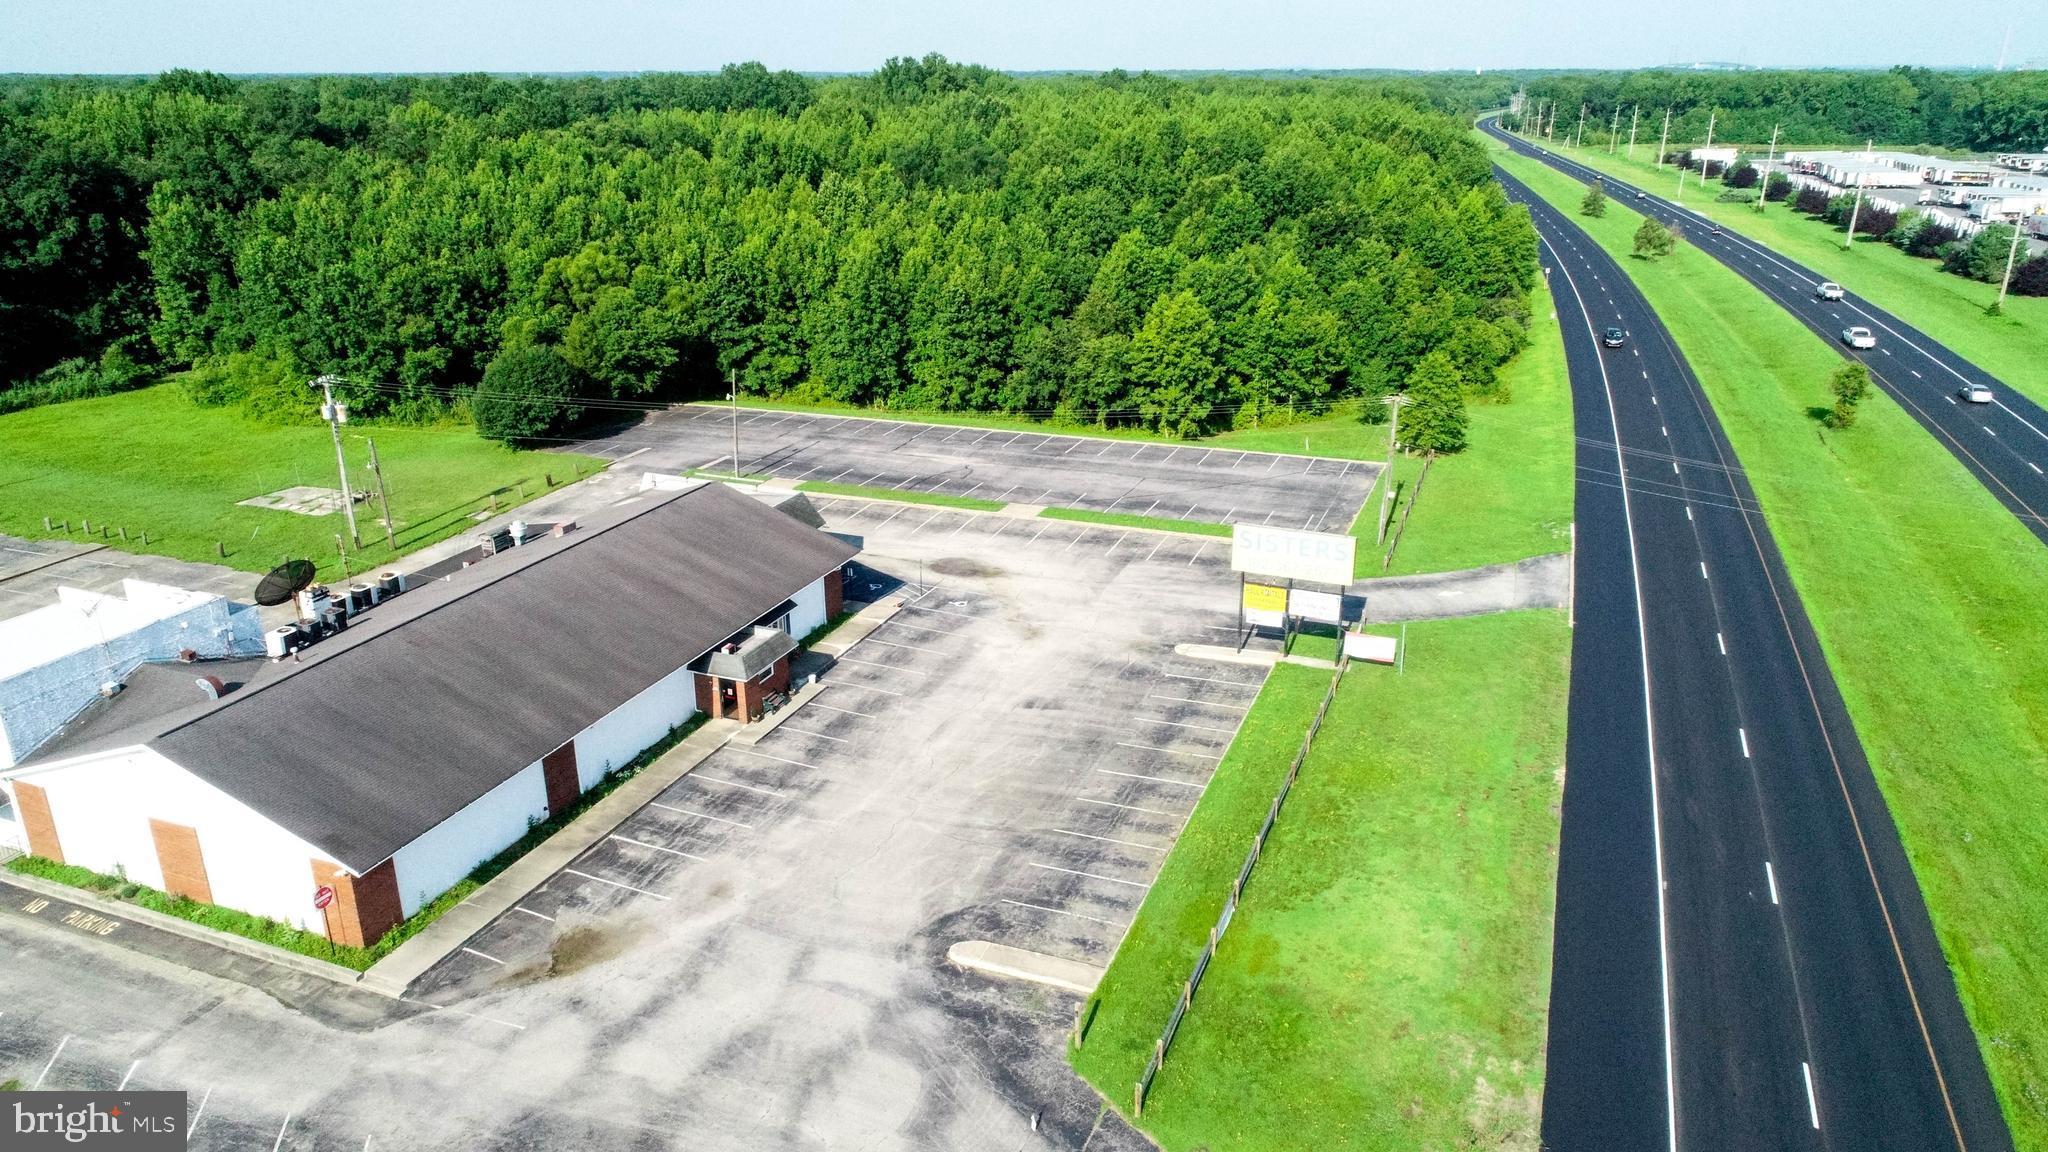 900 COURSES LANDING ROAD, PENNS GROVE, NJ 08069